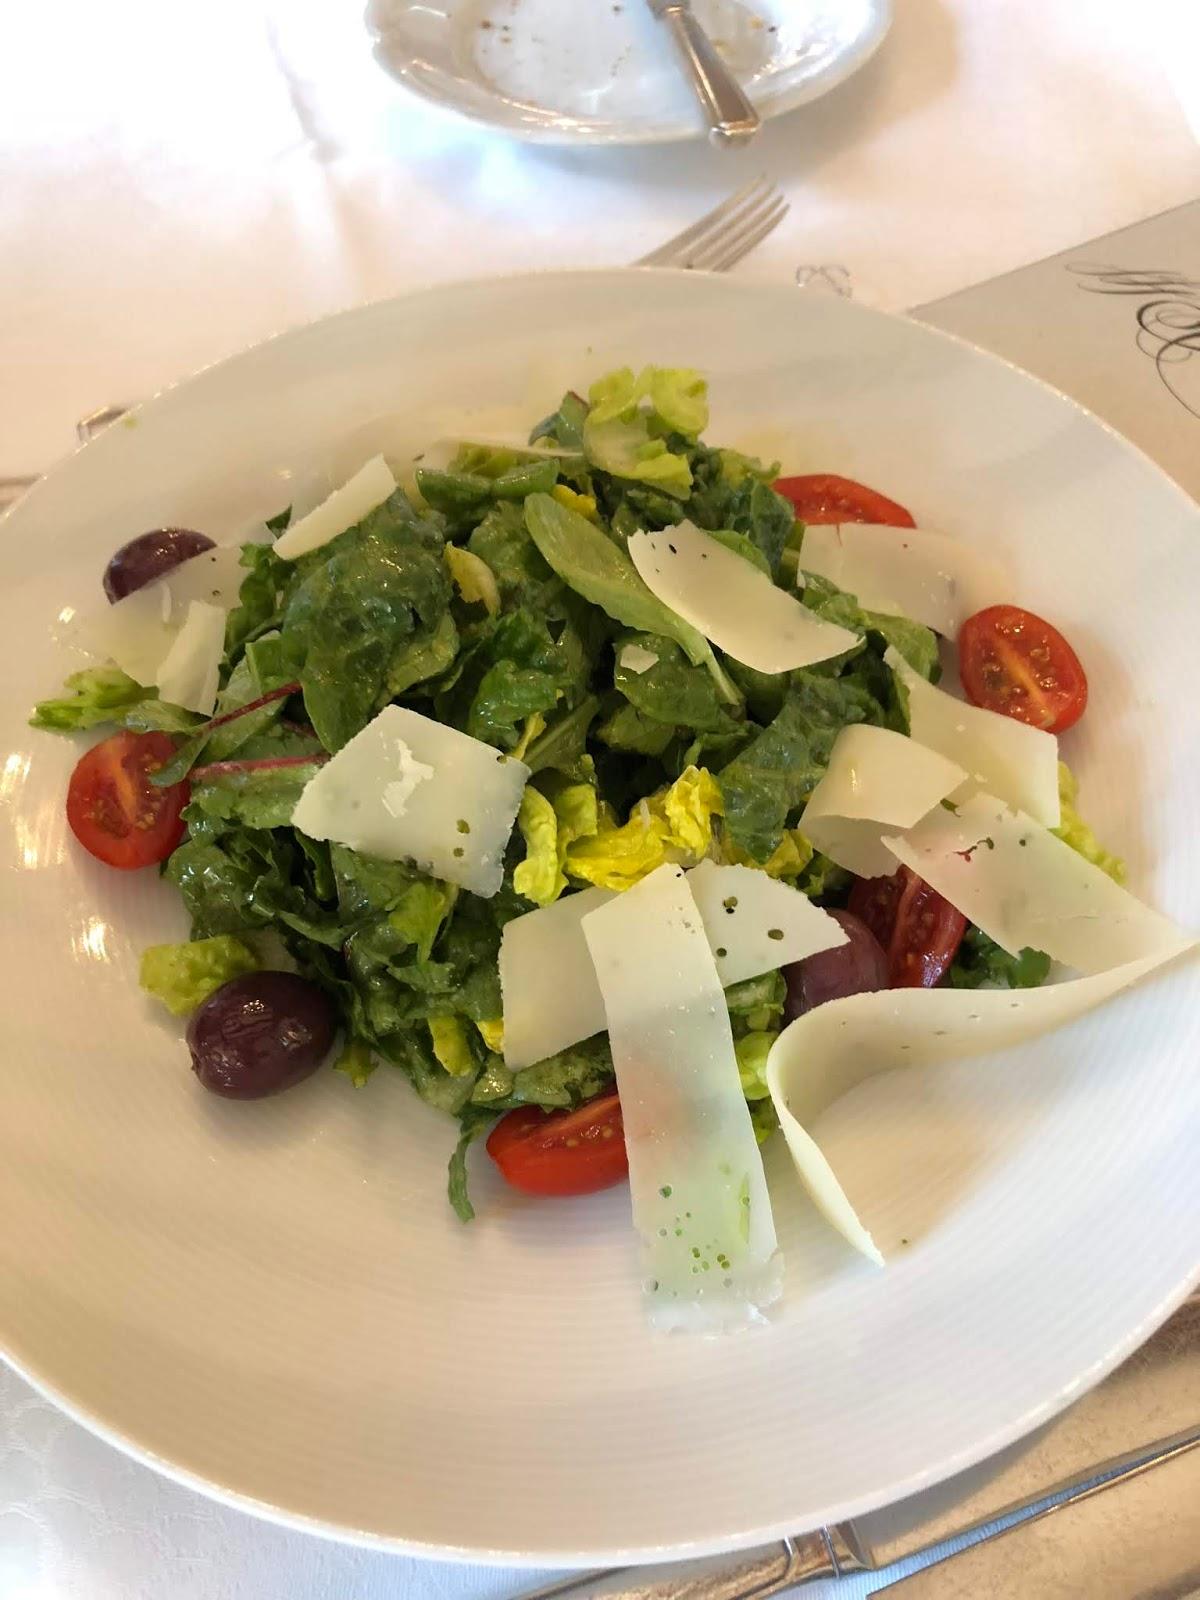 Salat mit Parmesan, Restaurant Scarpati, Wuppertal